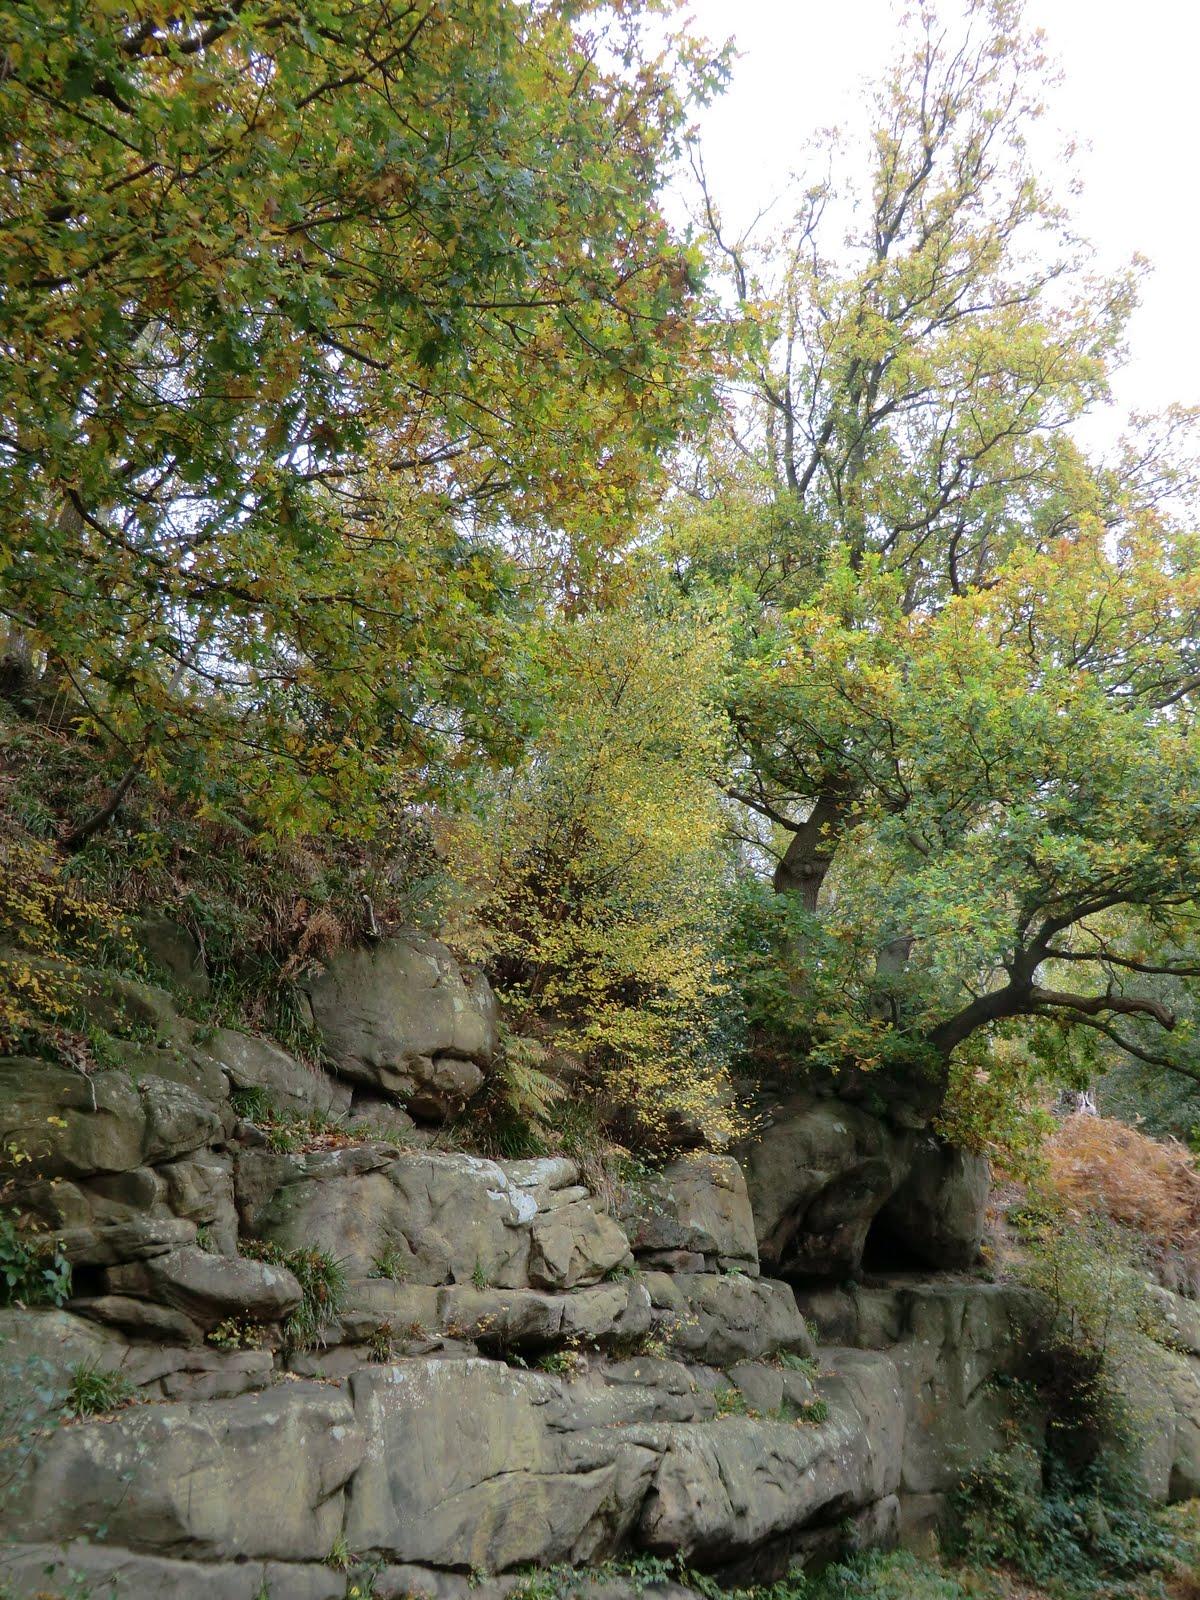 CIMG0212 Harrison's Rocks in autumn